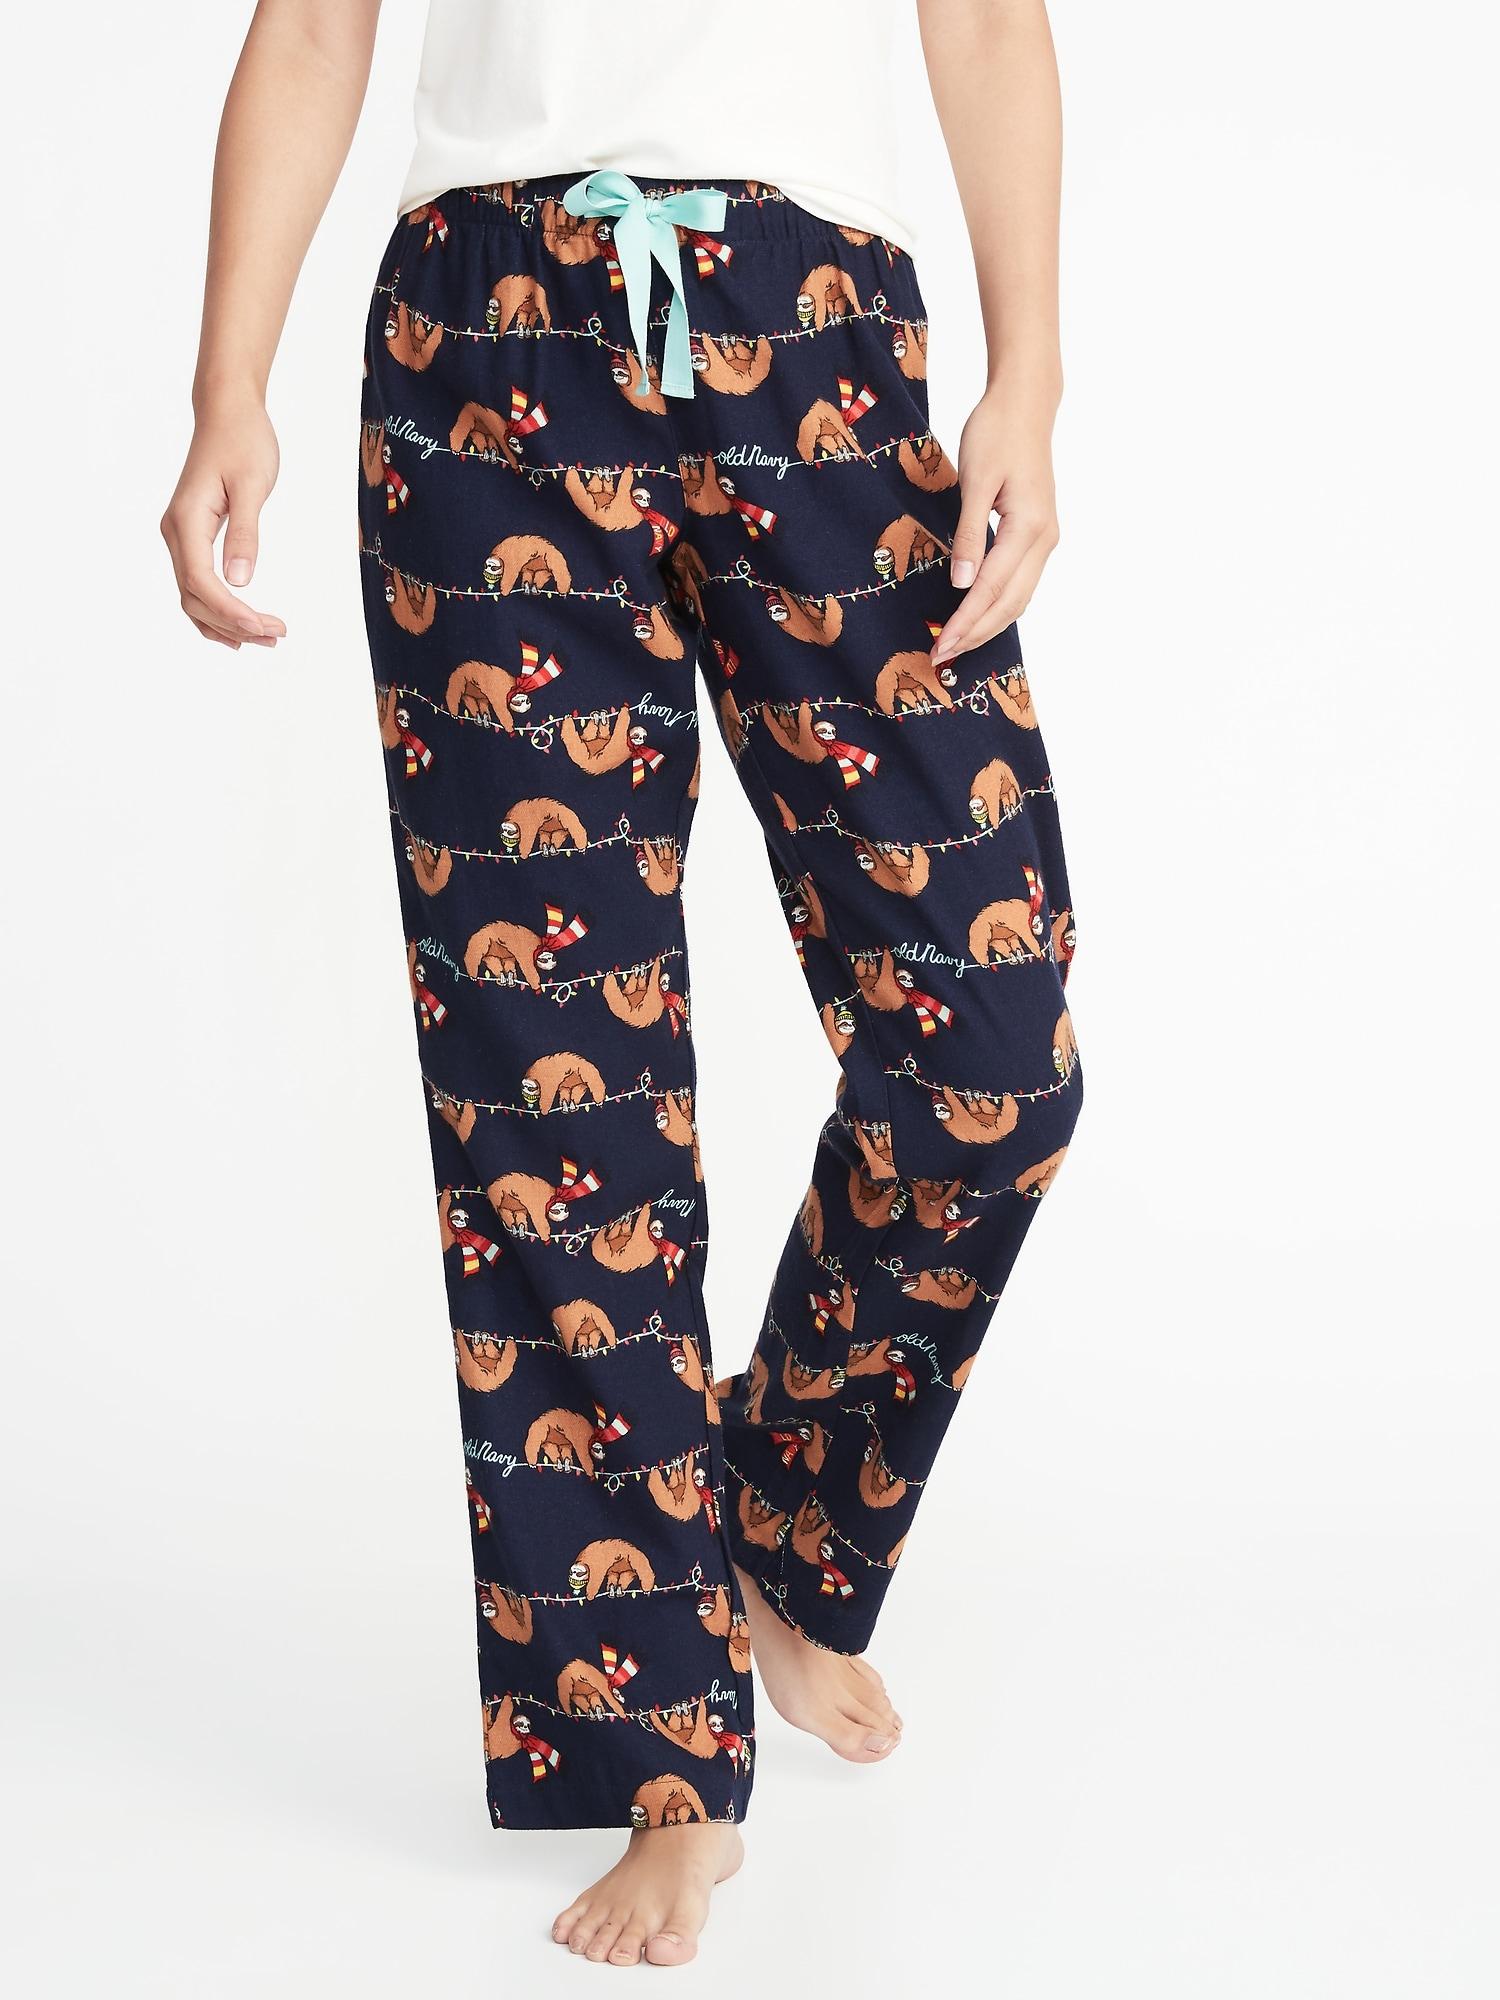 Patterned Pants Womens Amazing Design